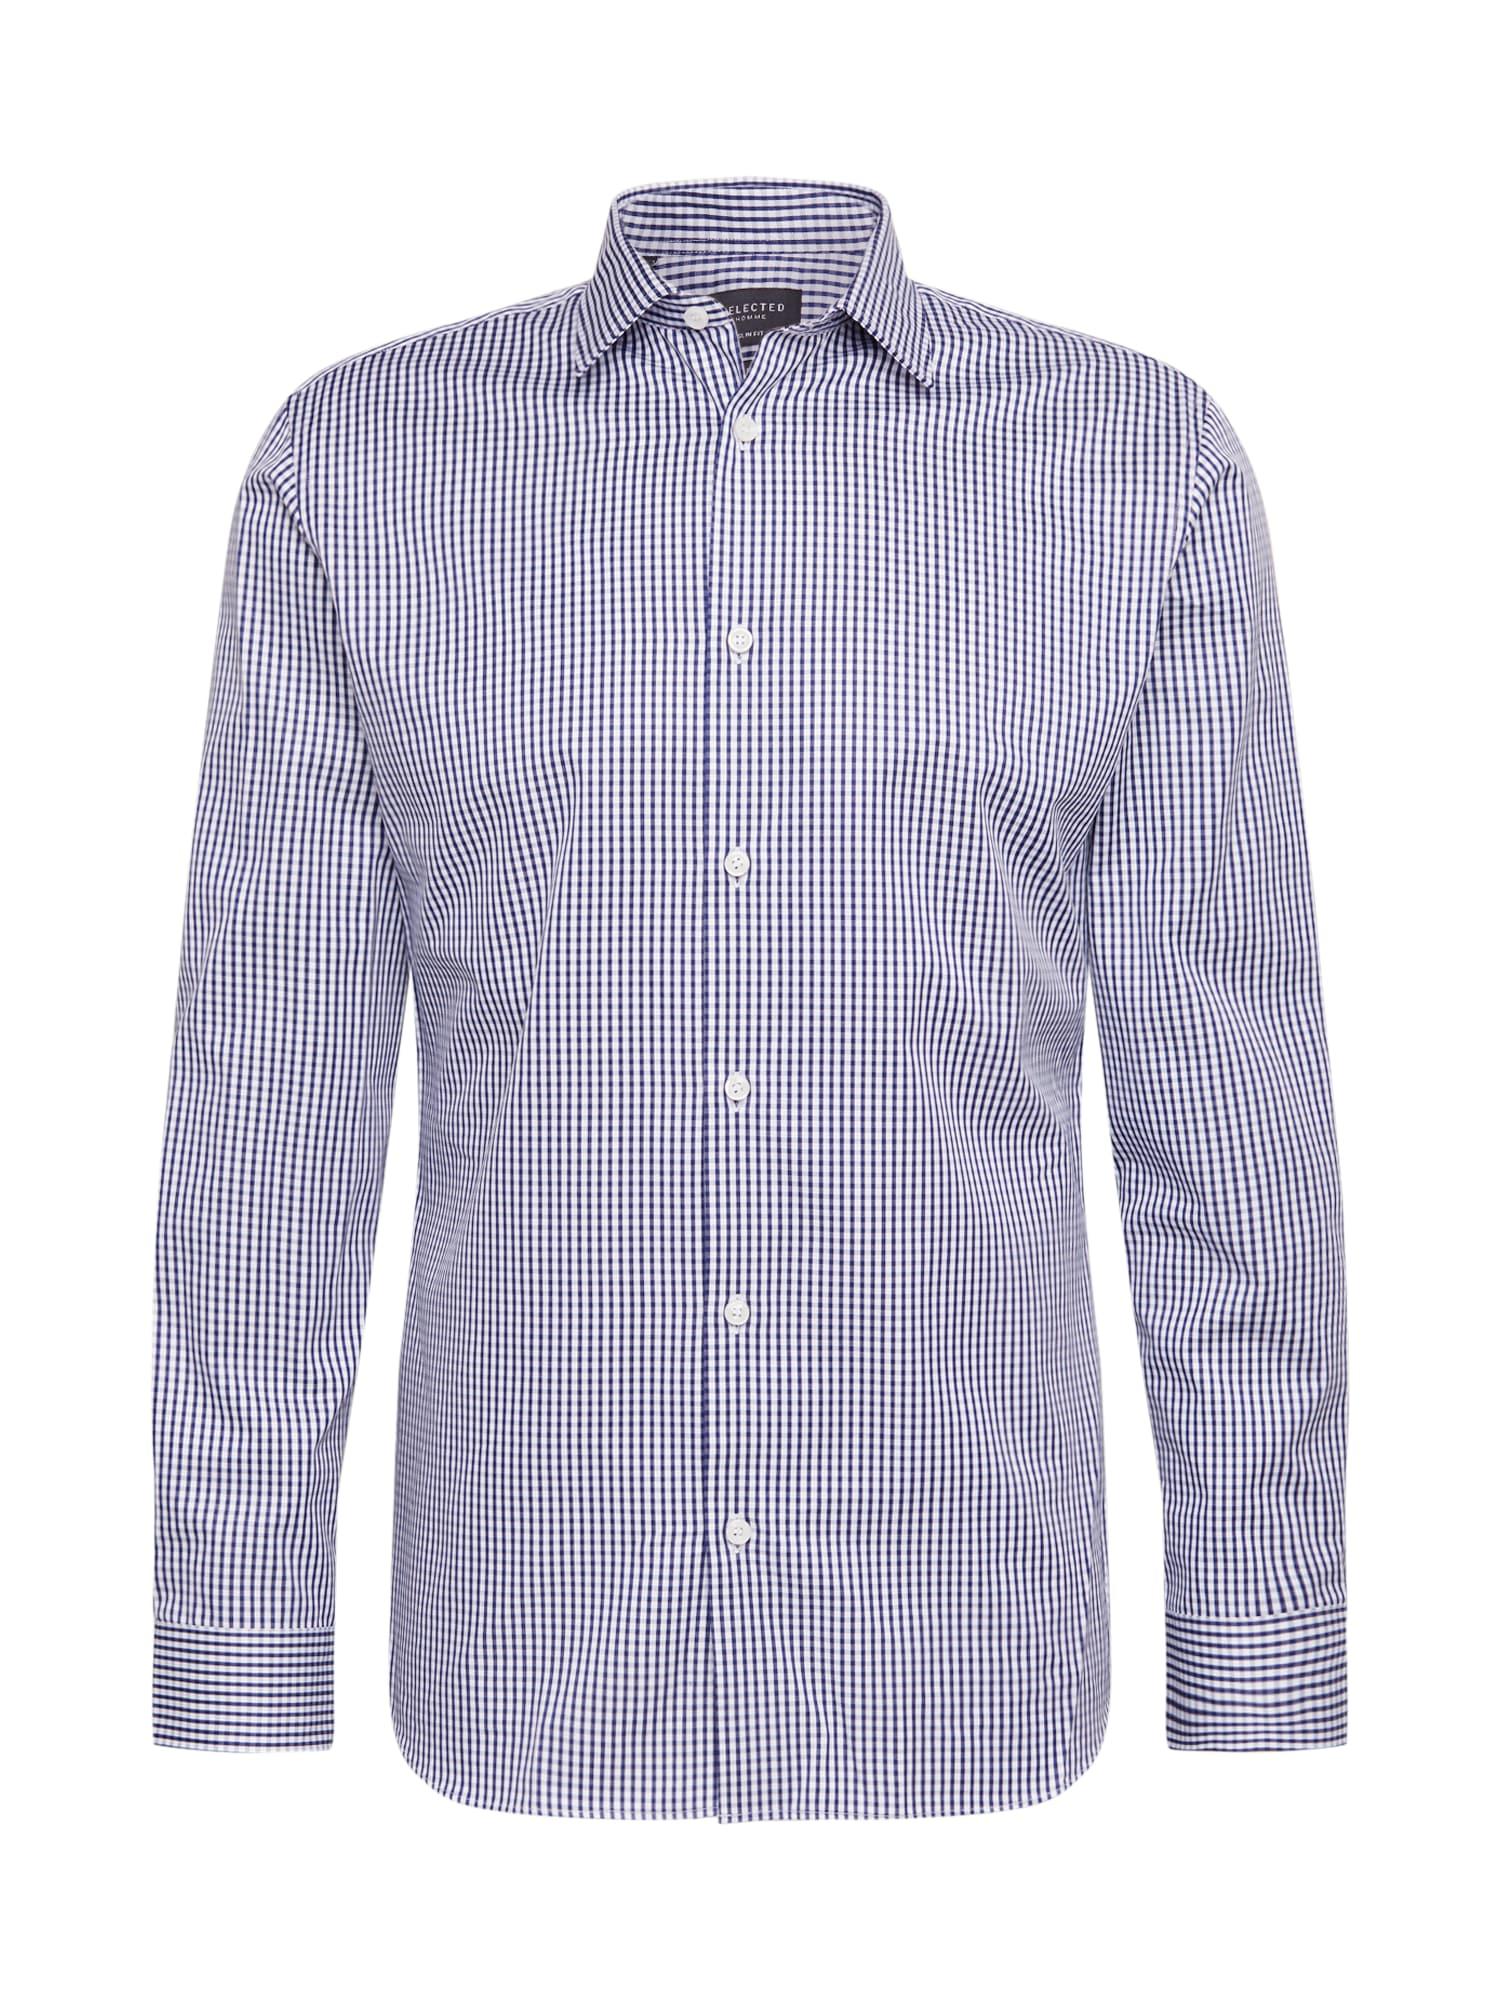 SELECTED HOMME Marškiniai tamsiai mėlyna / balta